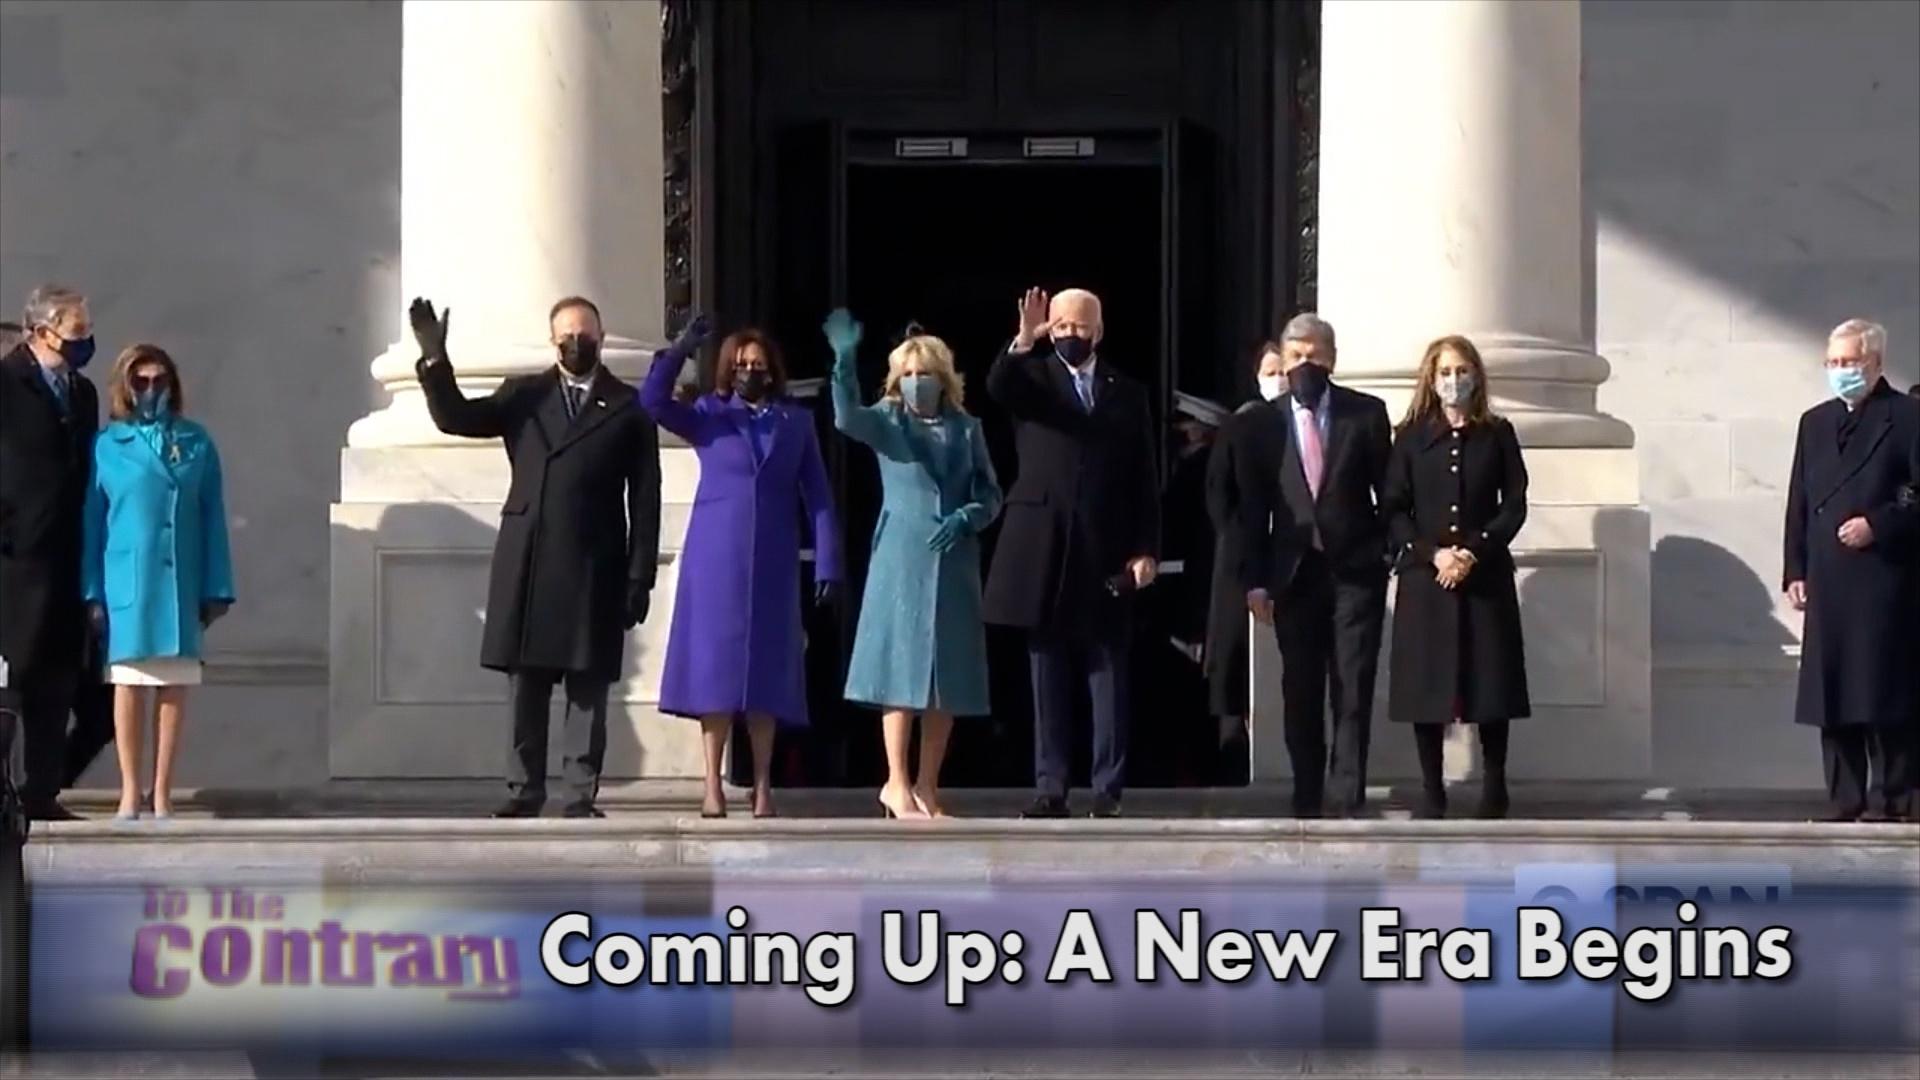 President Biden & Vice President Harris' Inauguration